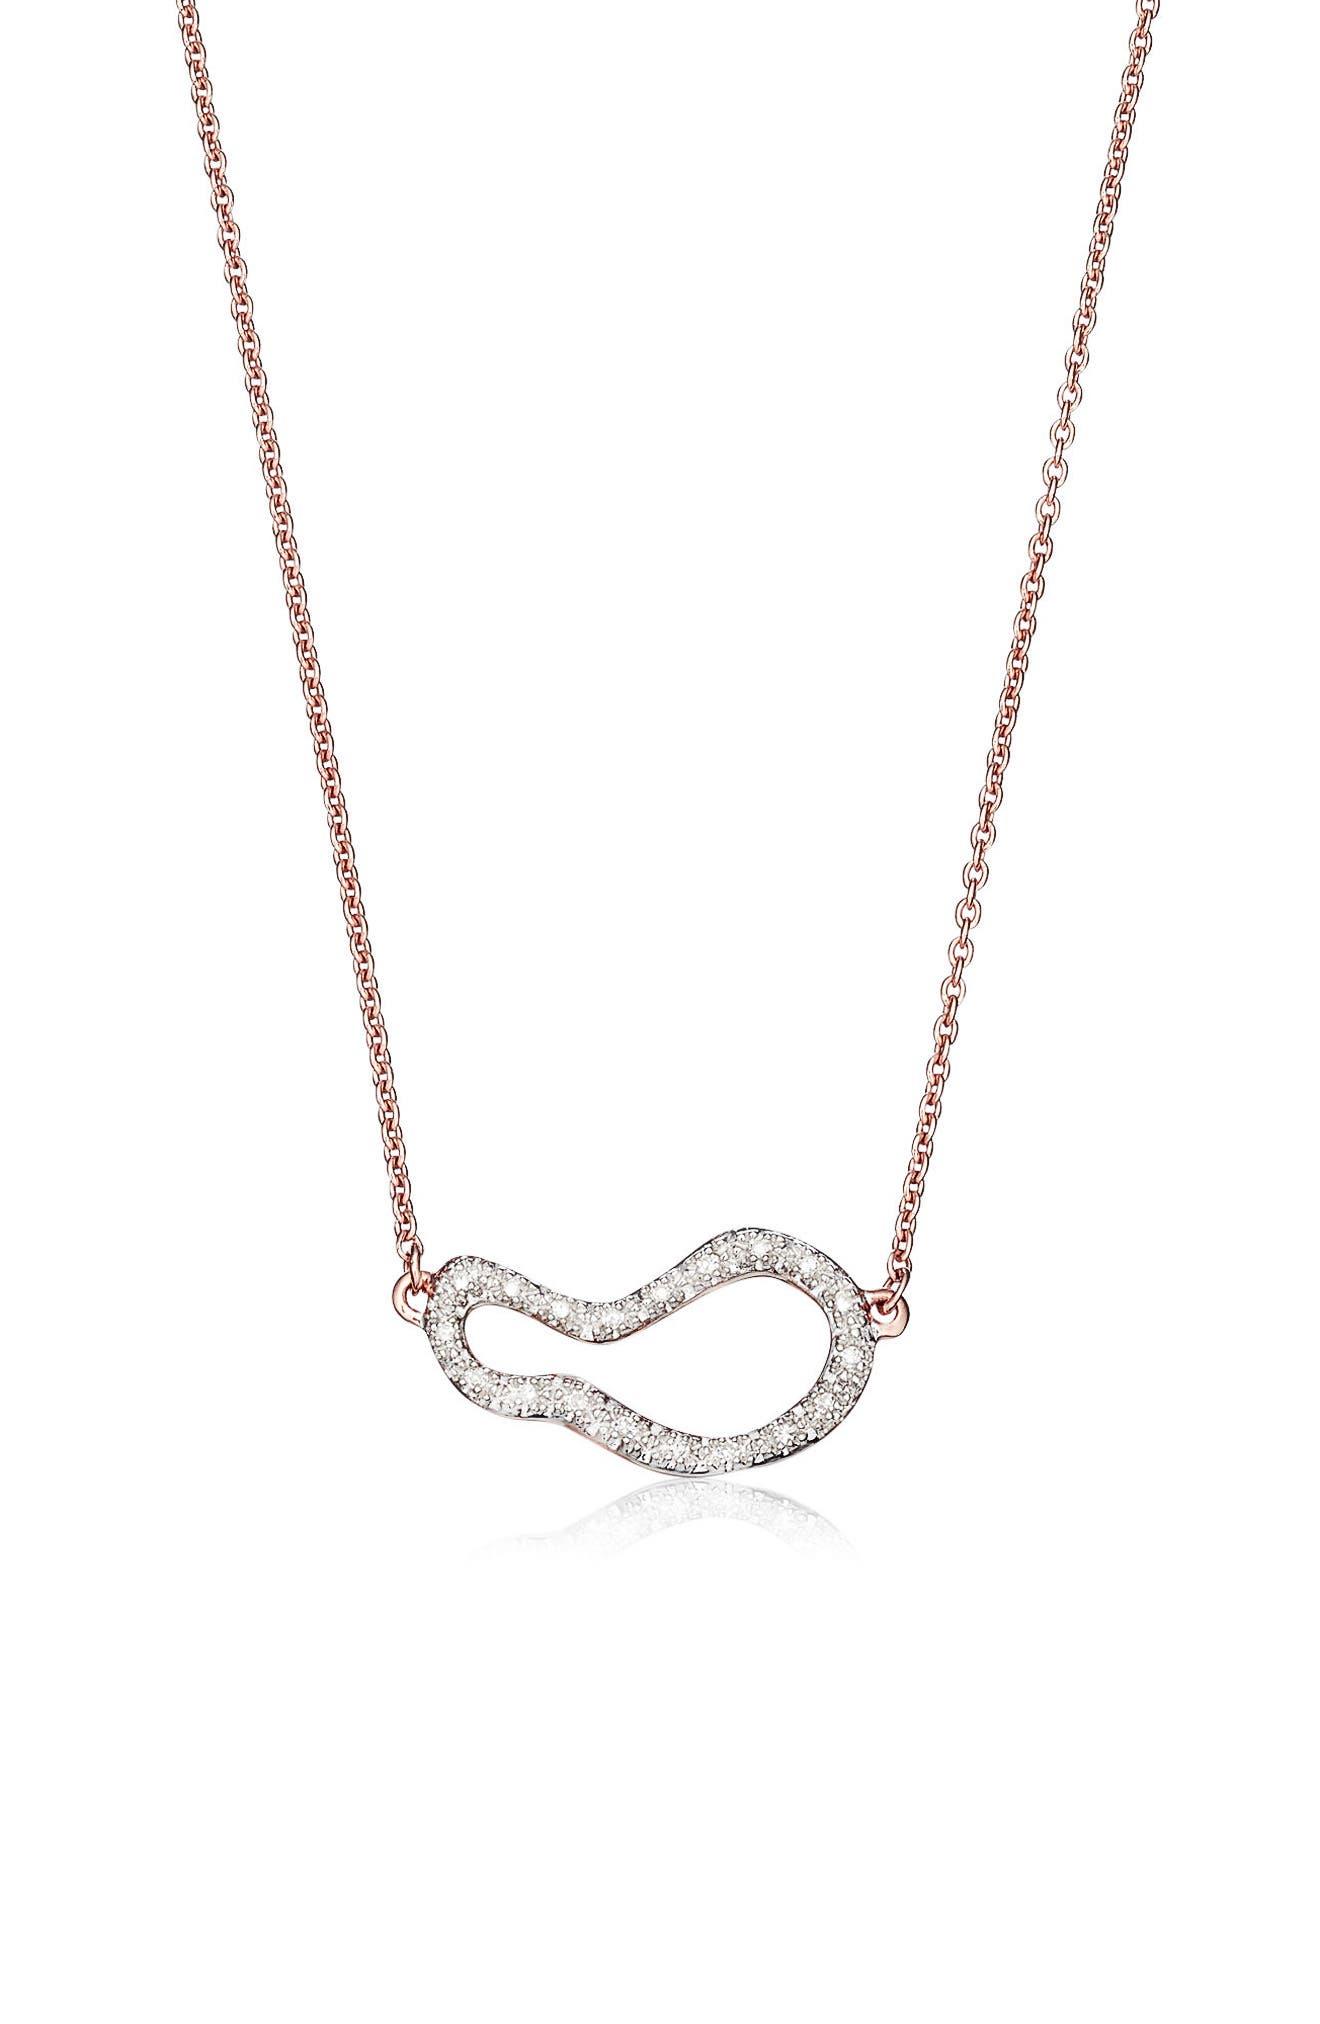 Riva Small Diamond Pendant Necklace,                             Main thumbnail 1, color,                             665